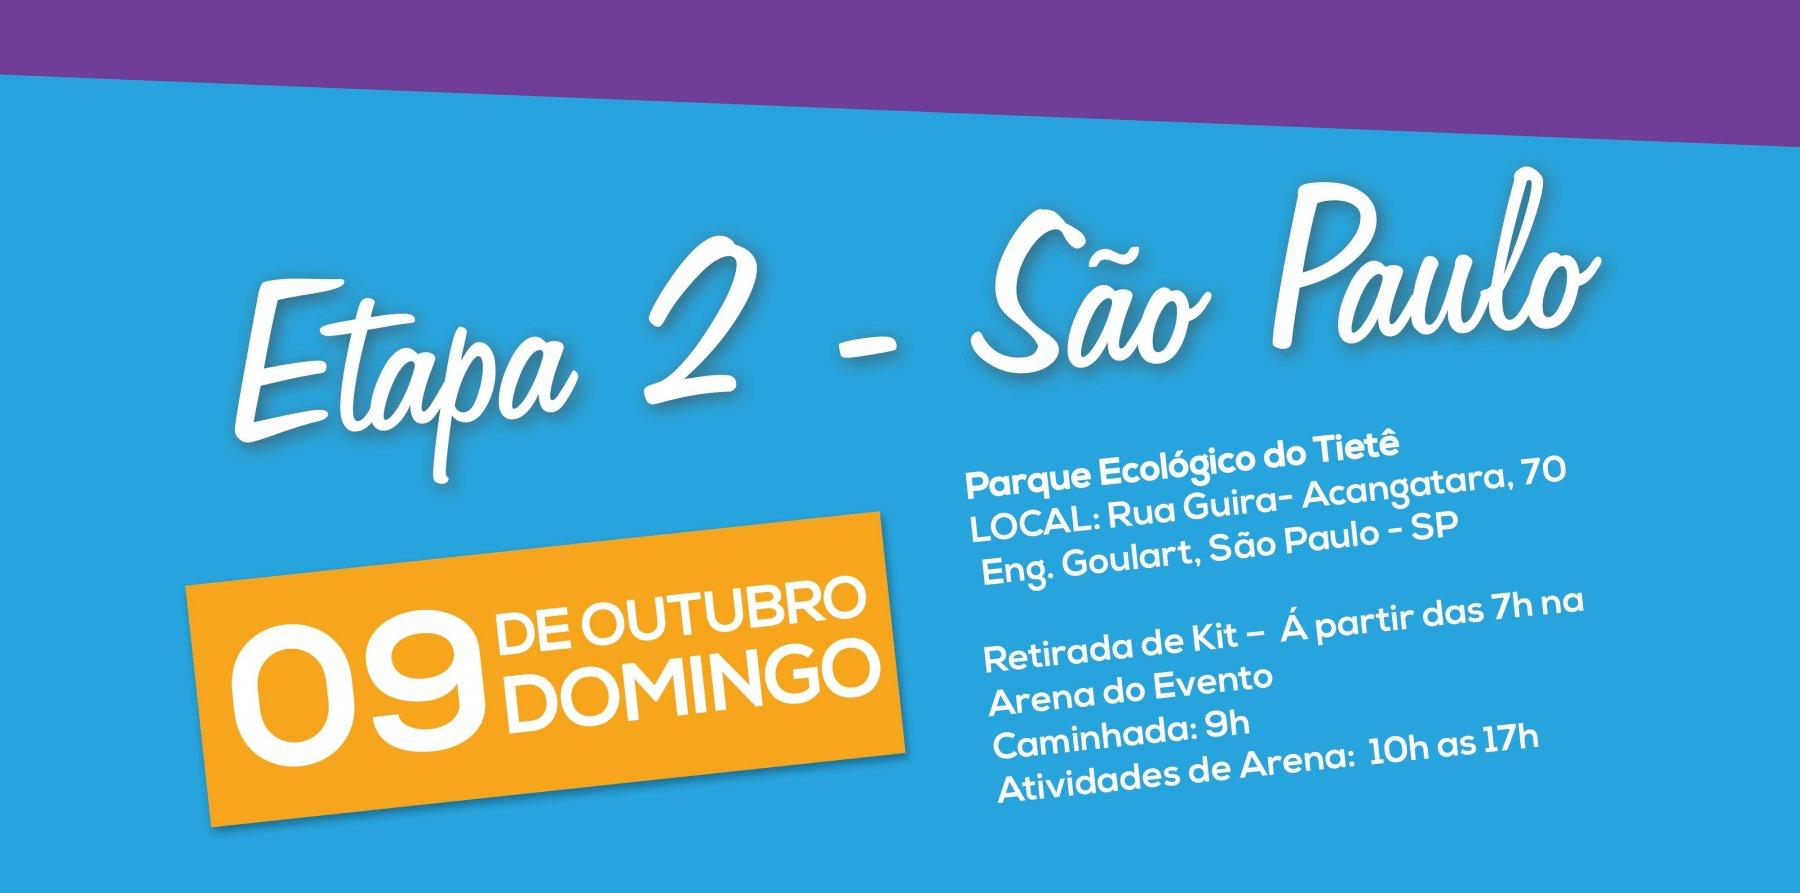 etapa-2-sao-paulo